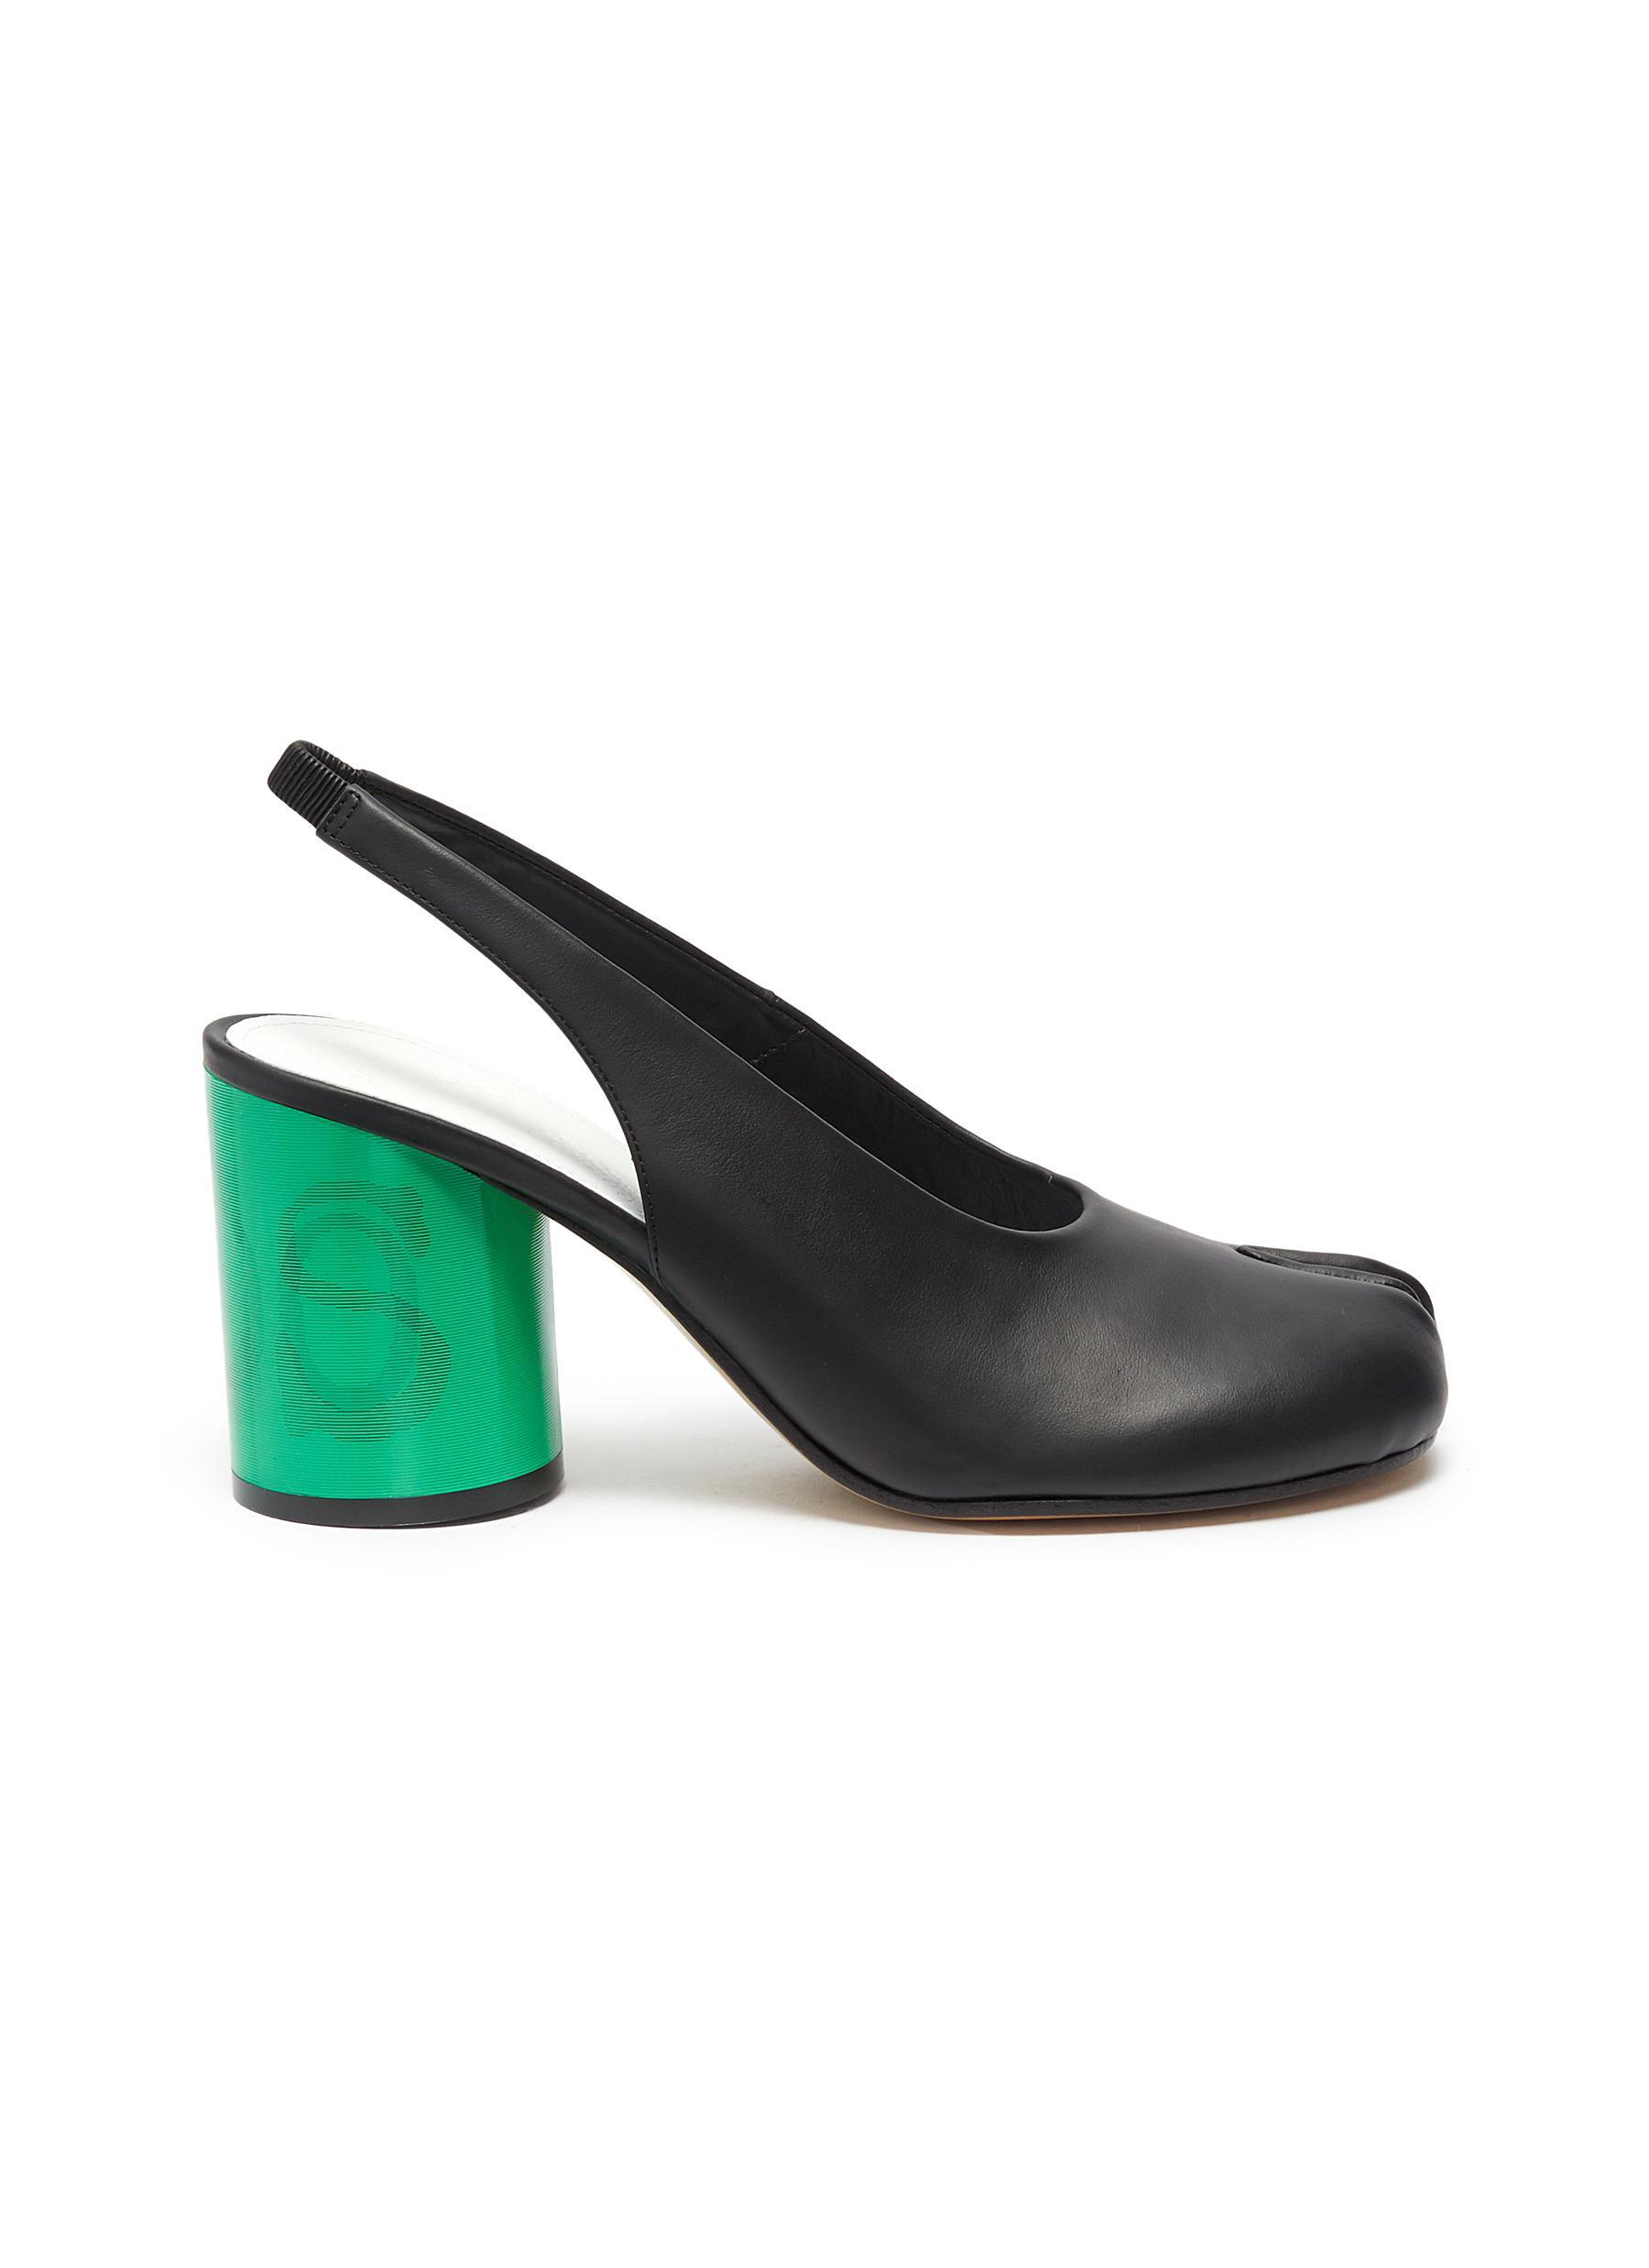 Maison Margiela High Heels Tabi Yes No lenticular heel slingback pumps